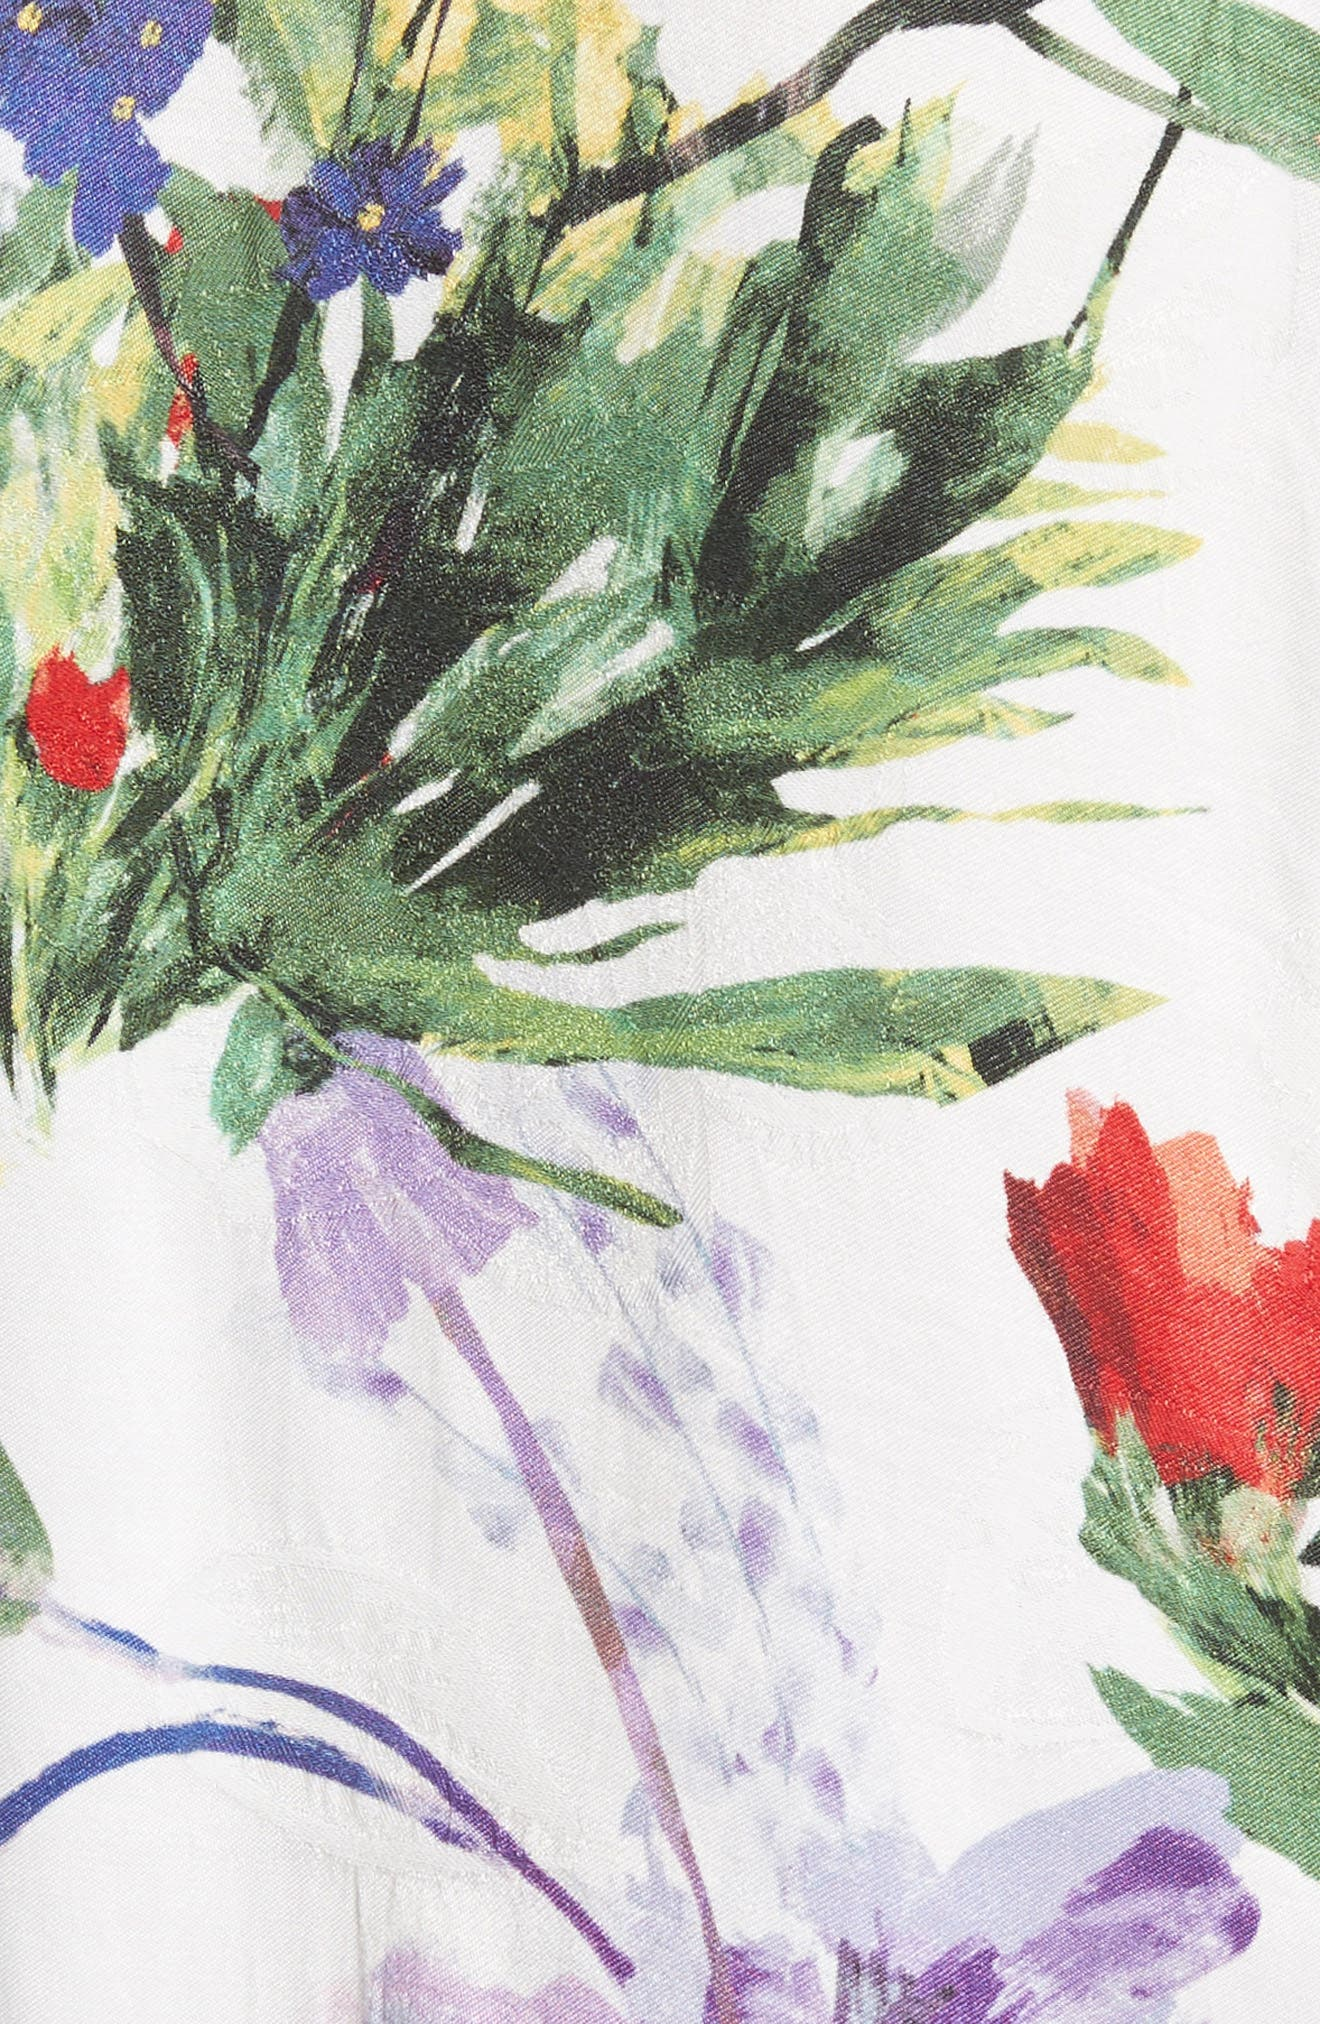 Hellen Boxy Floral Print Tee,                             Alternate thumbnail 5, color,                             176